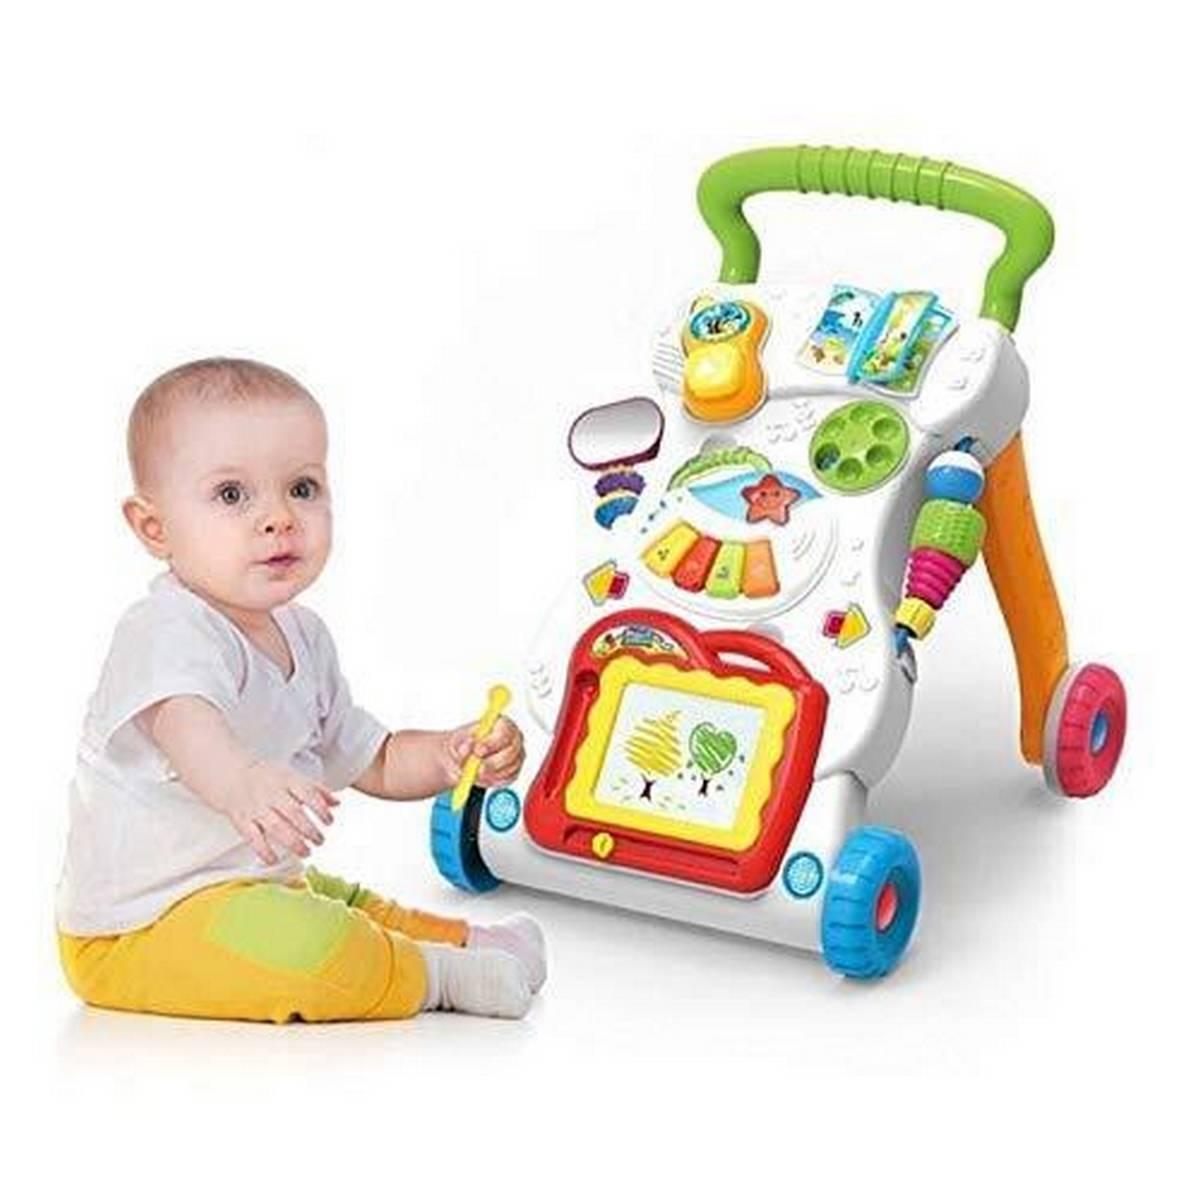 Baby Activity Walker best for baby & birthday gift